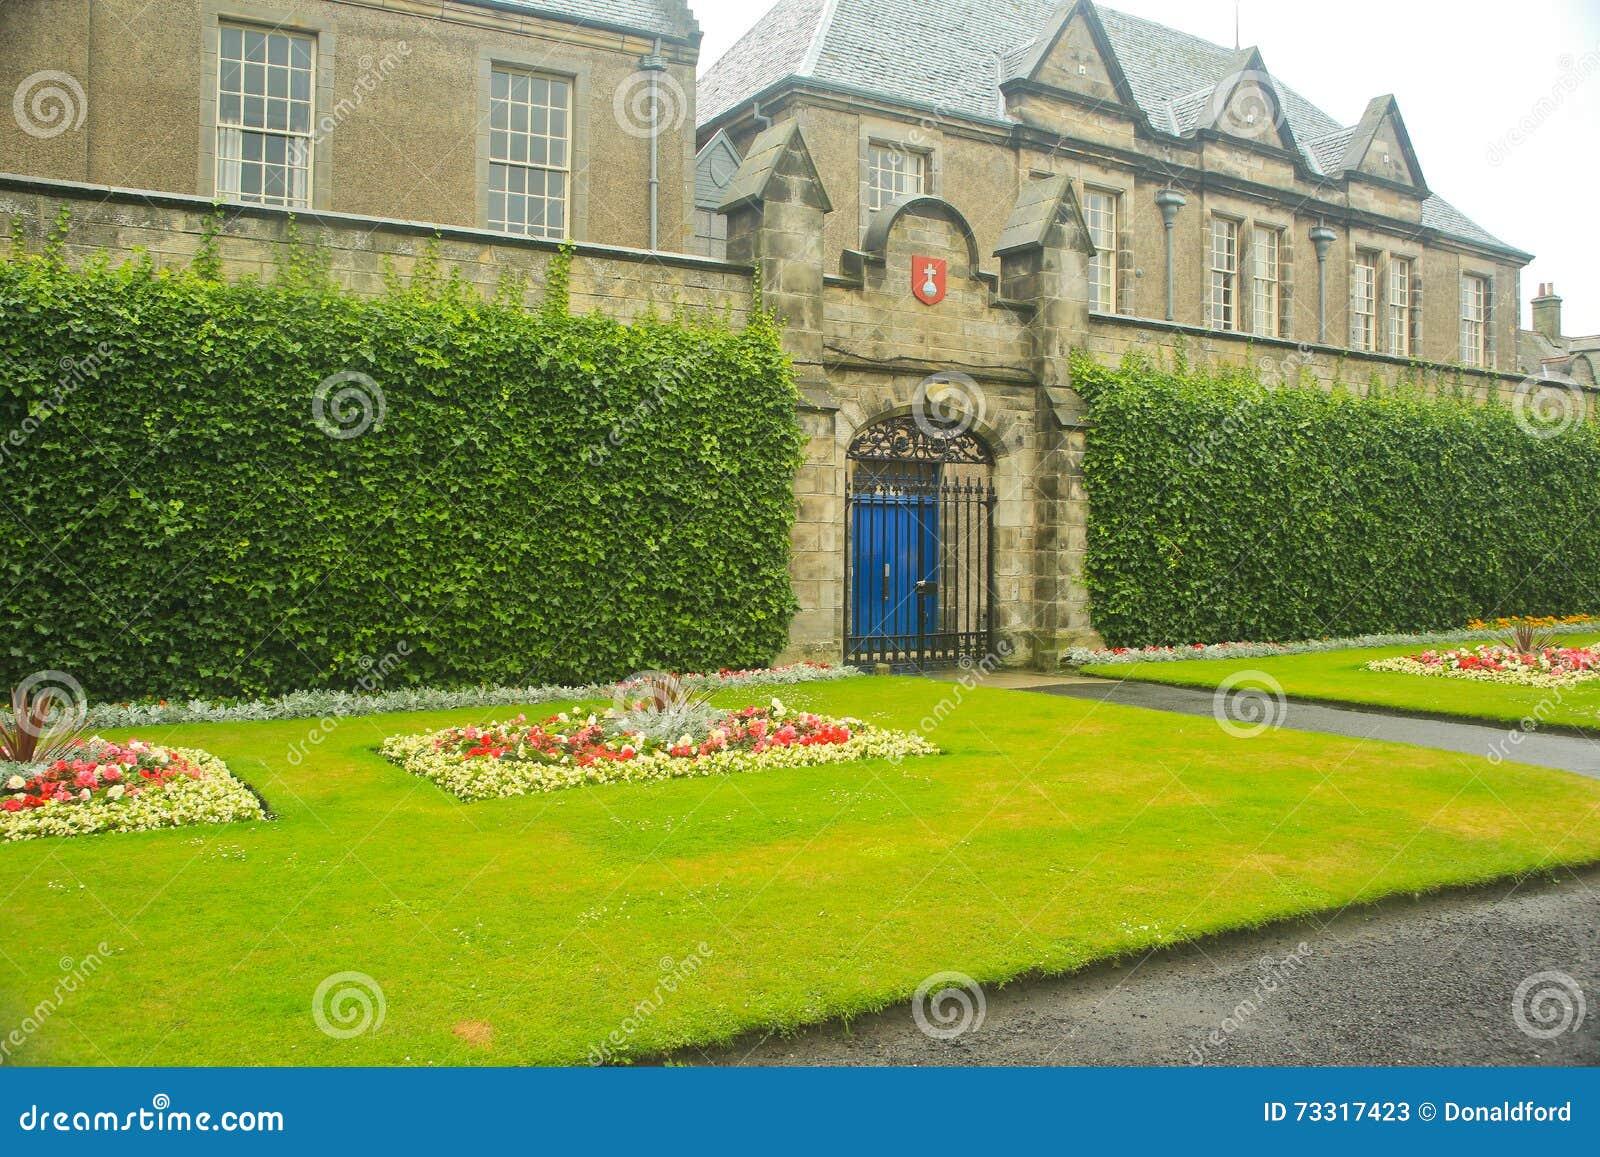 Formalny ogród, uniwersytet St Andrews, StAndrews, UK